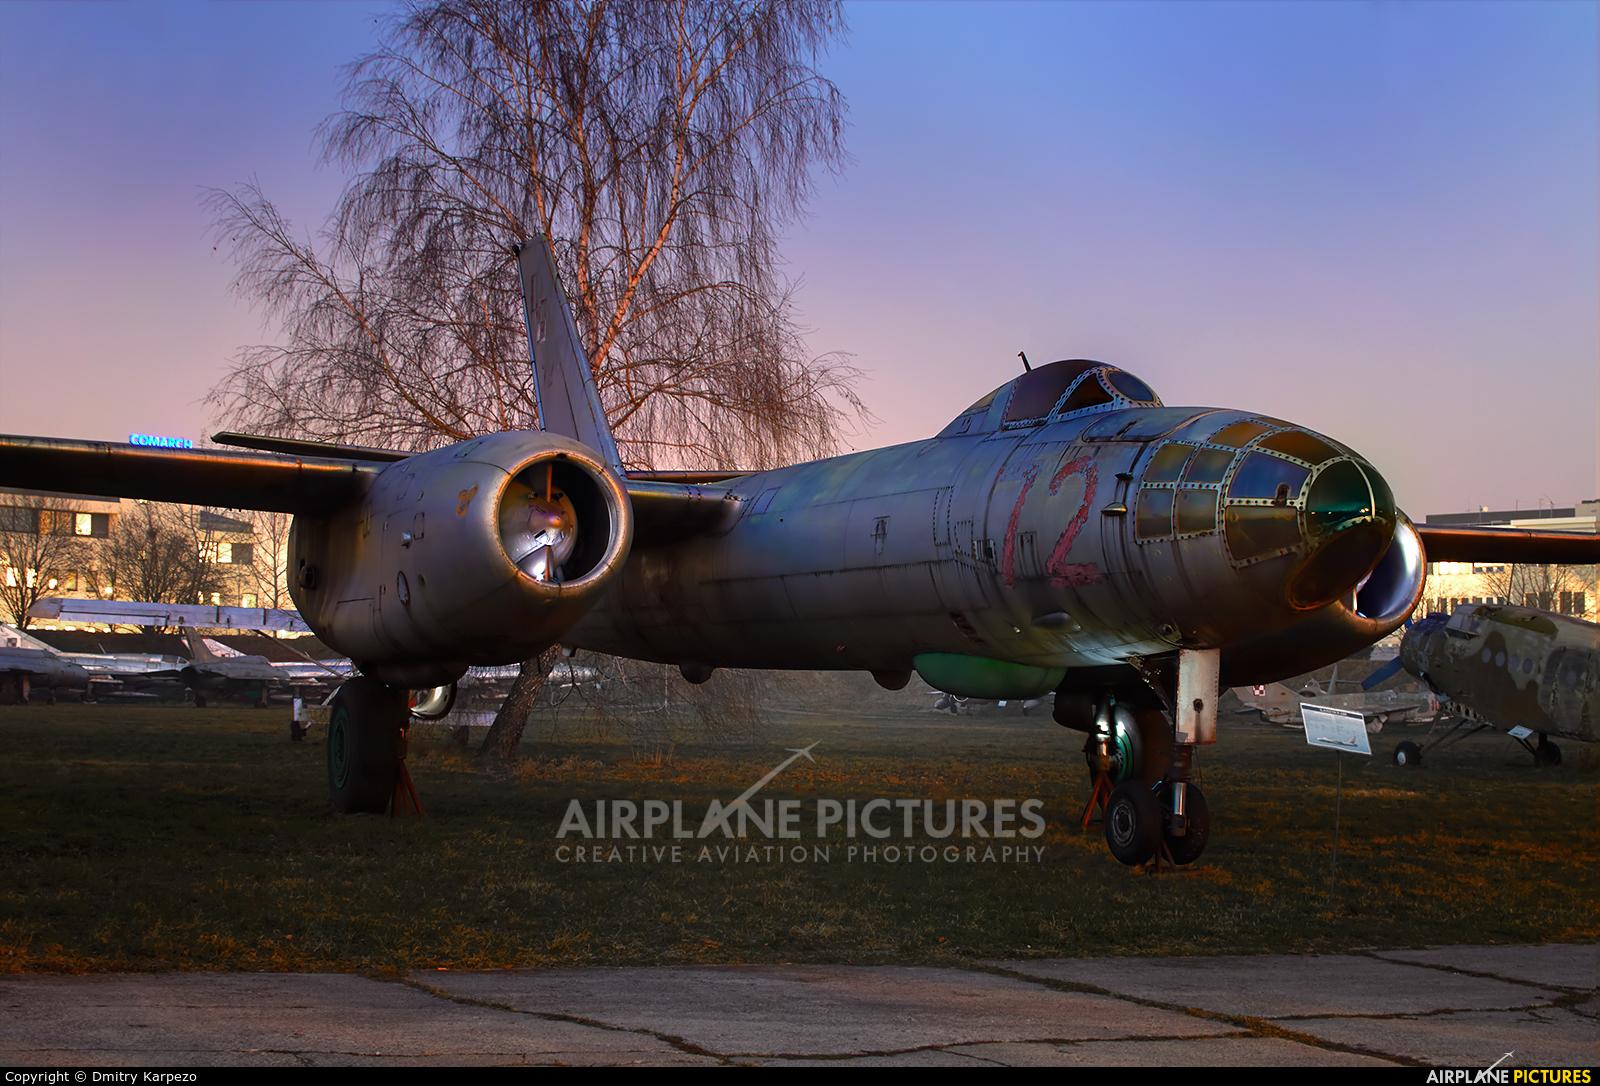 Poland - Air Force 72 aircraft at Kraków, Rakowice Czyżyny - Museum of Polish Aviation